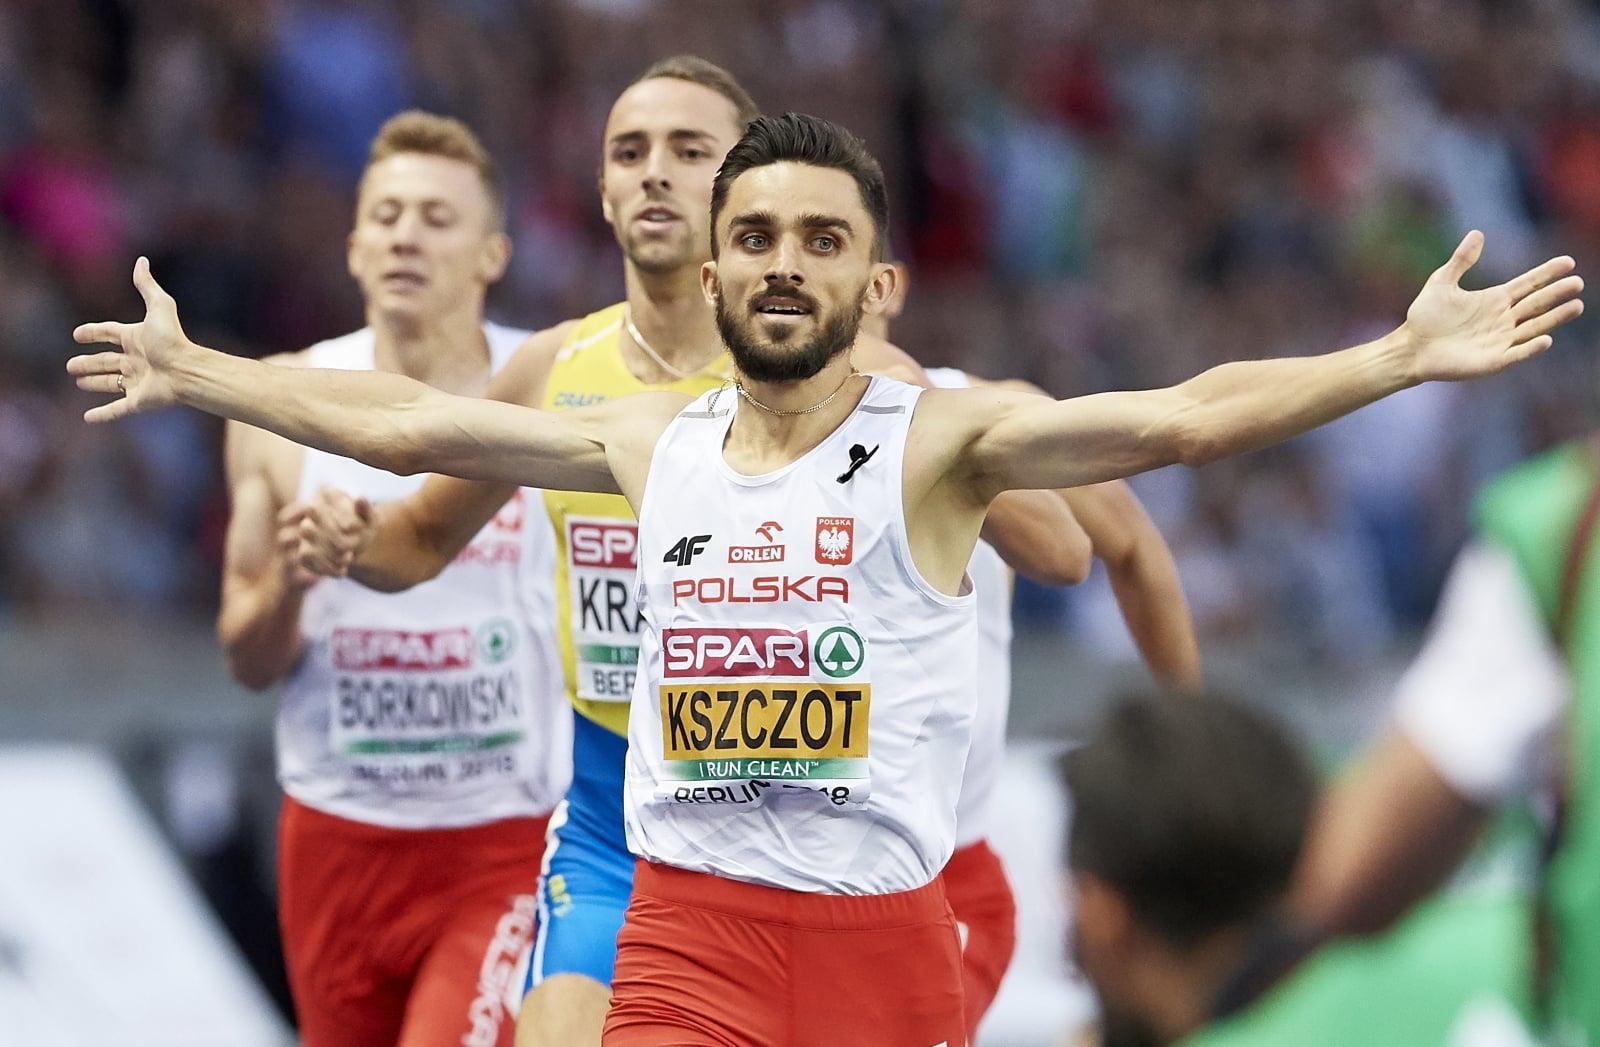 Lekkoatletyczne Mistrzostwa Europy fot. PAP/Adam Warżawa